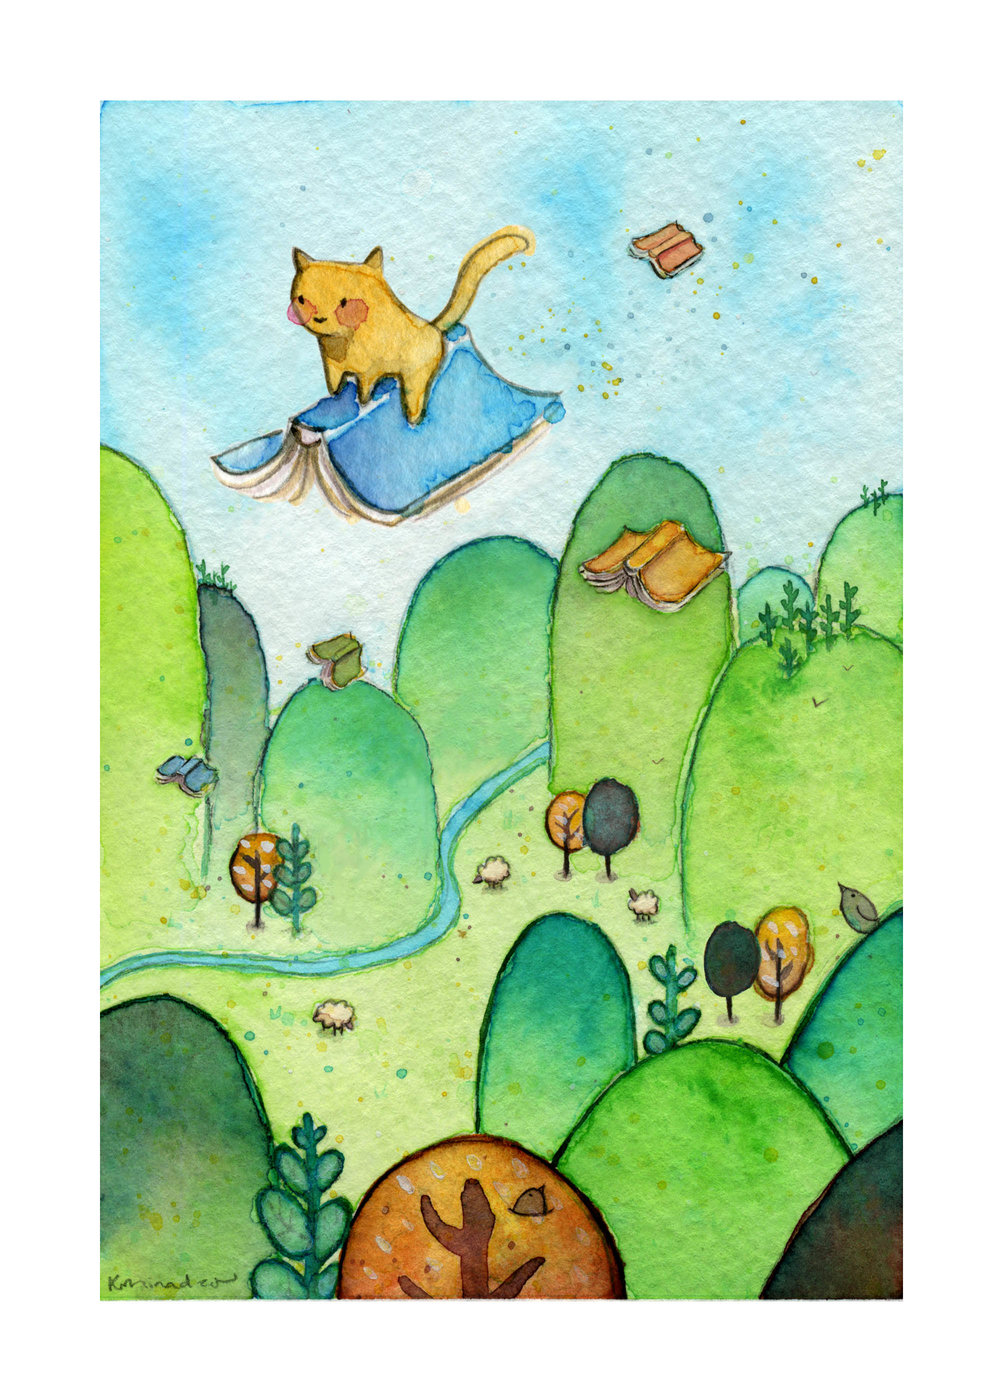 2016_0727 Cat Riding Books 2 400dpi 1MB.jpg